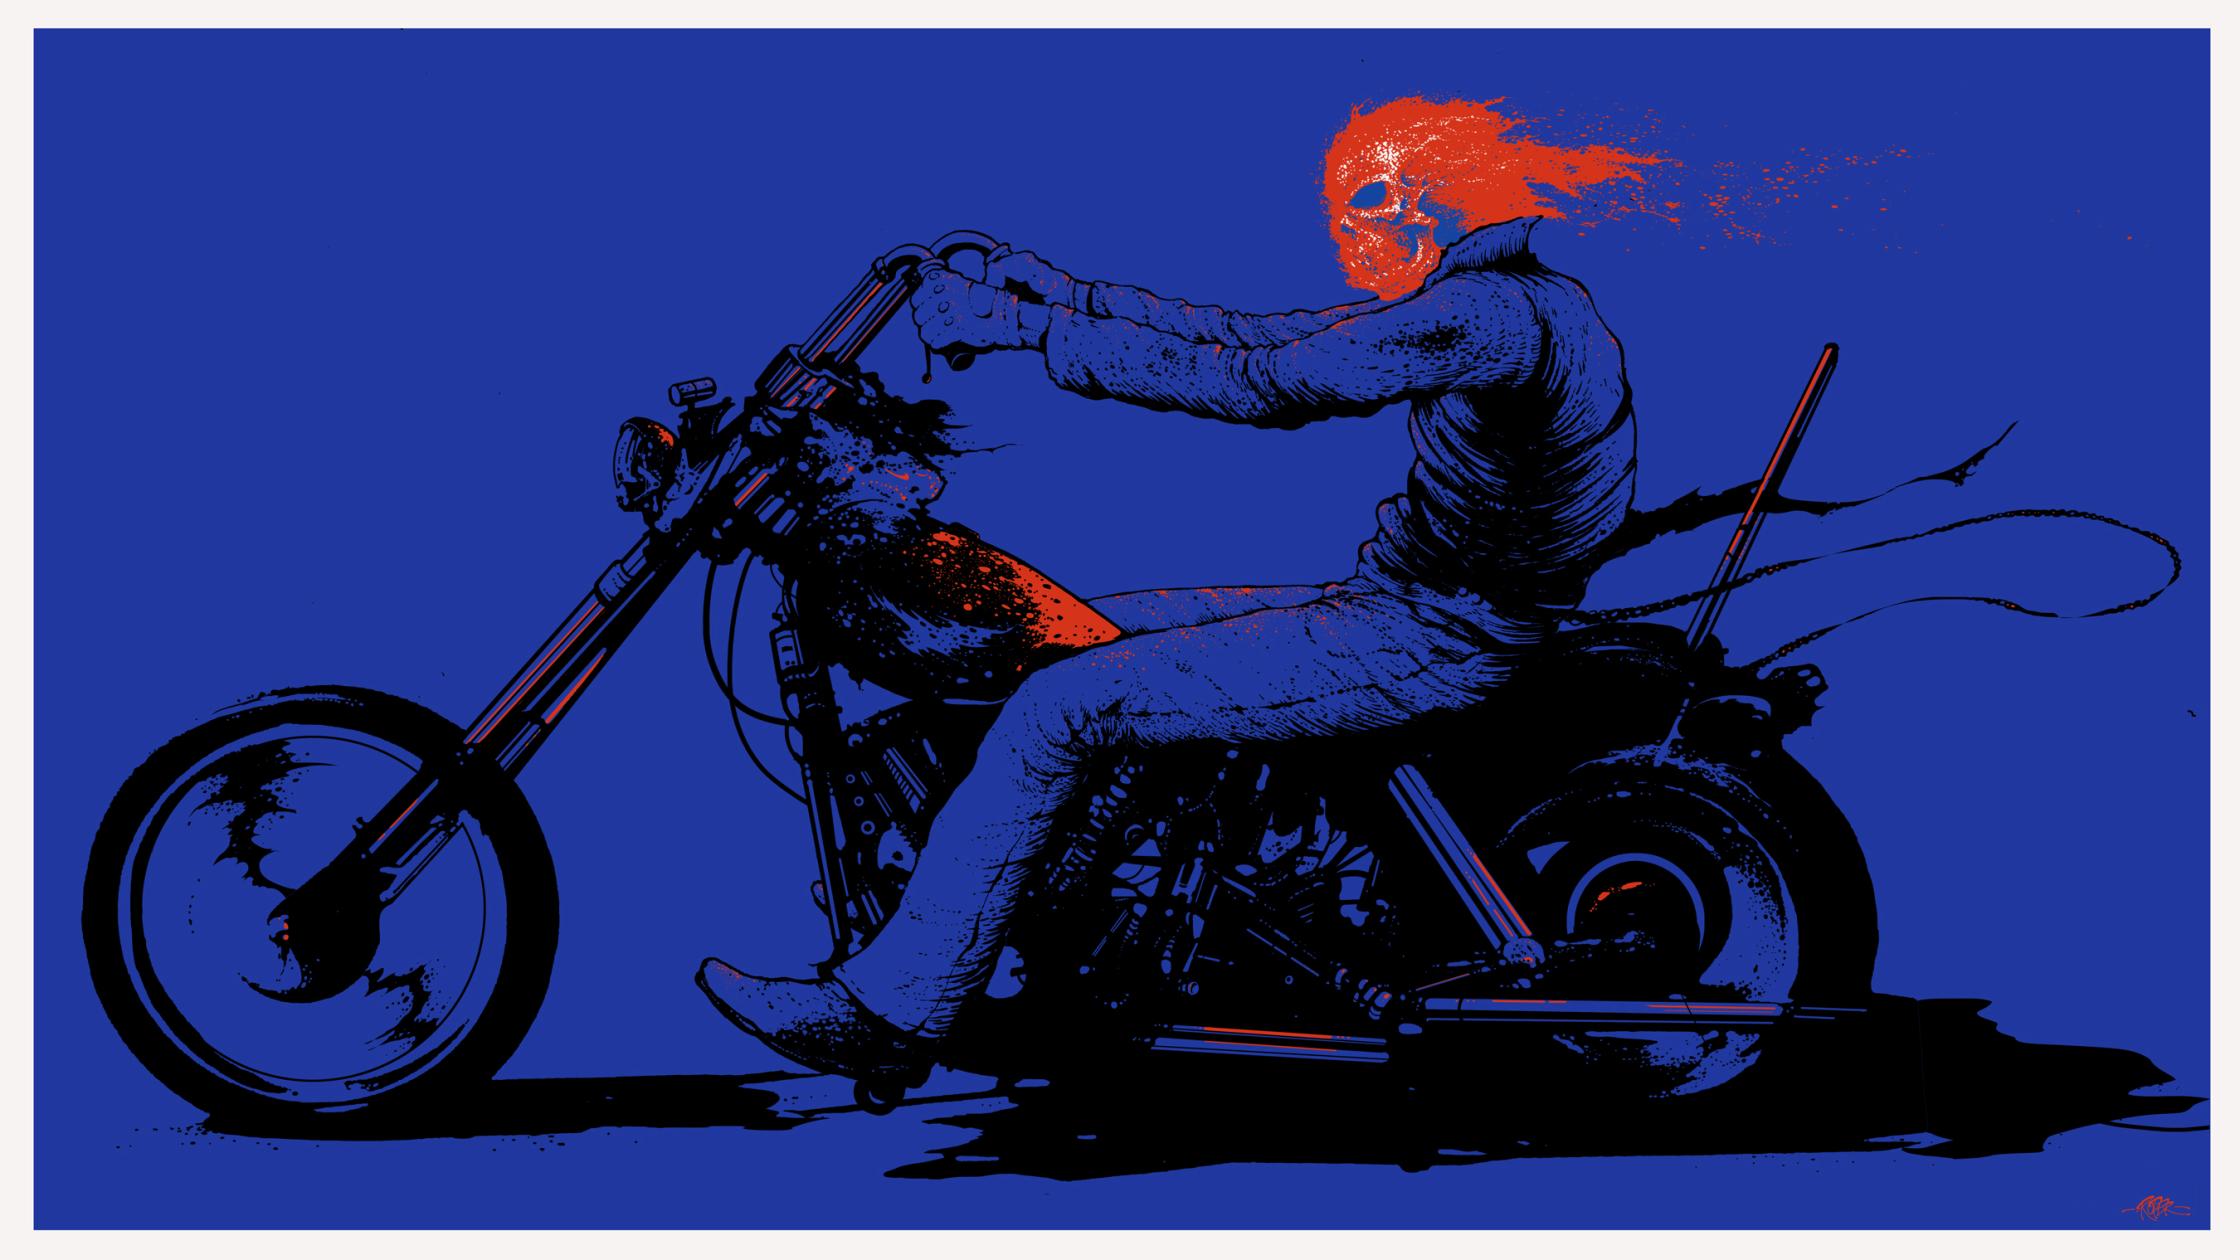 19-ghostrider.jpg